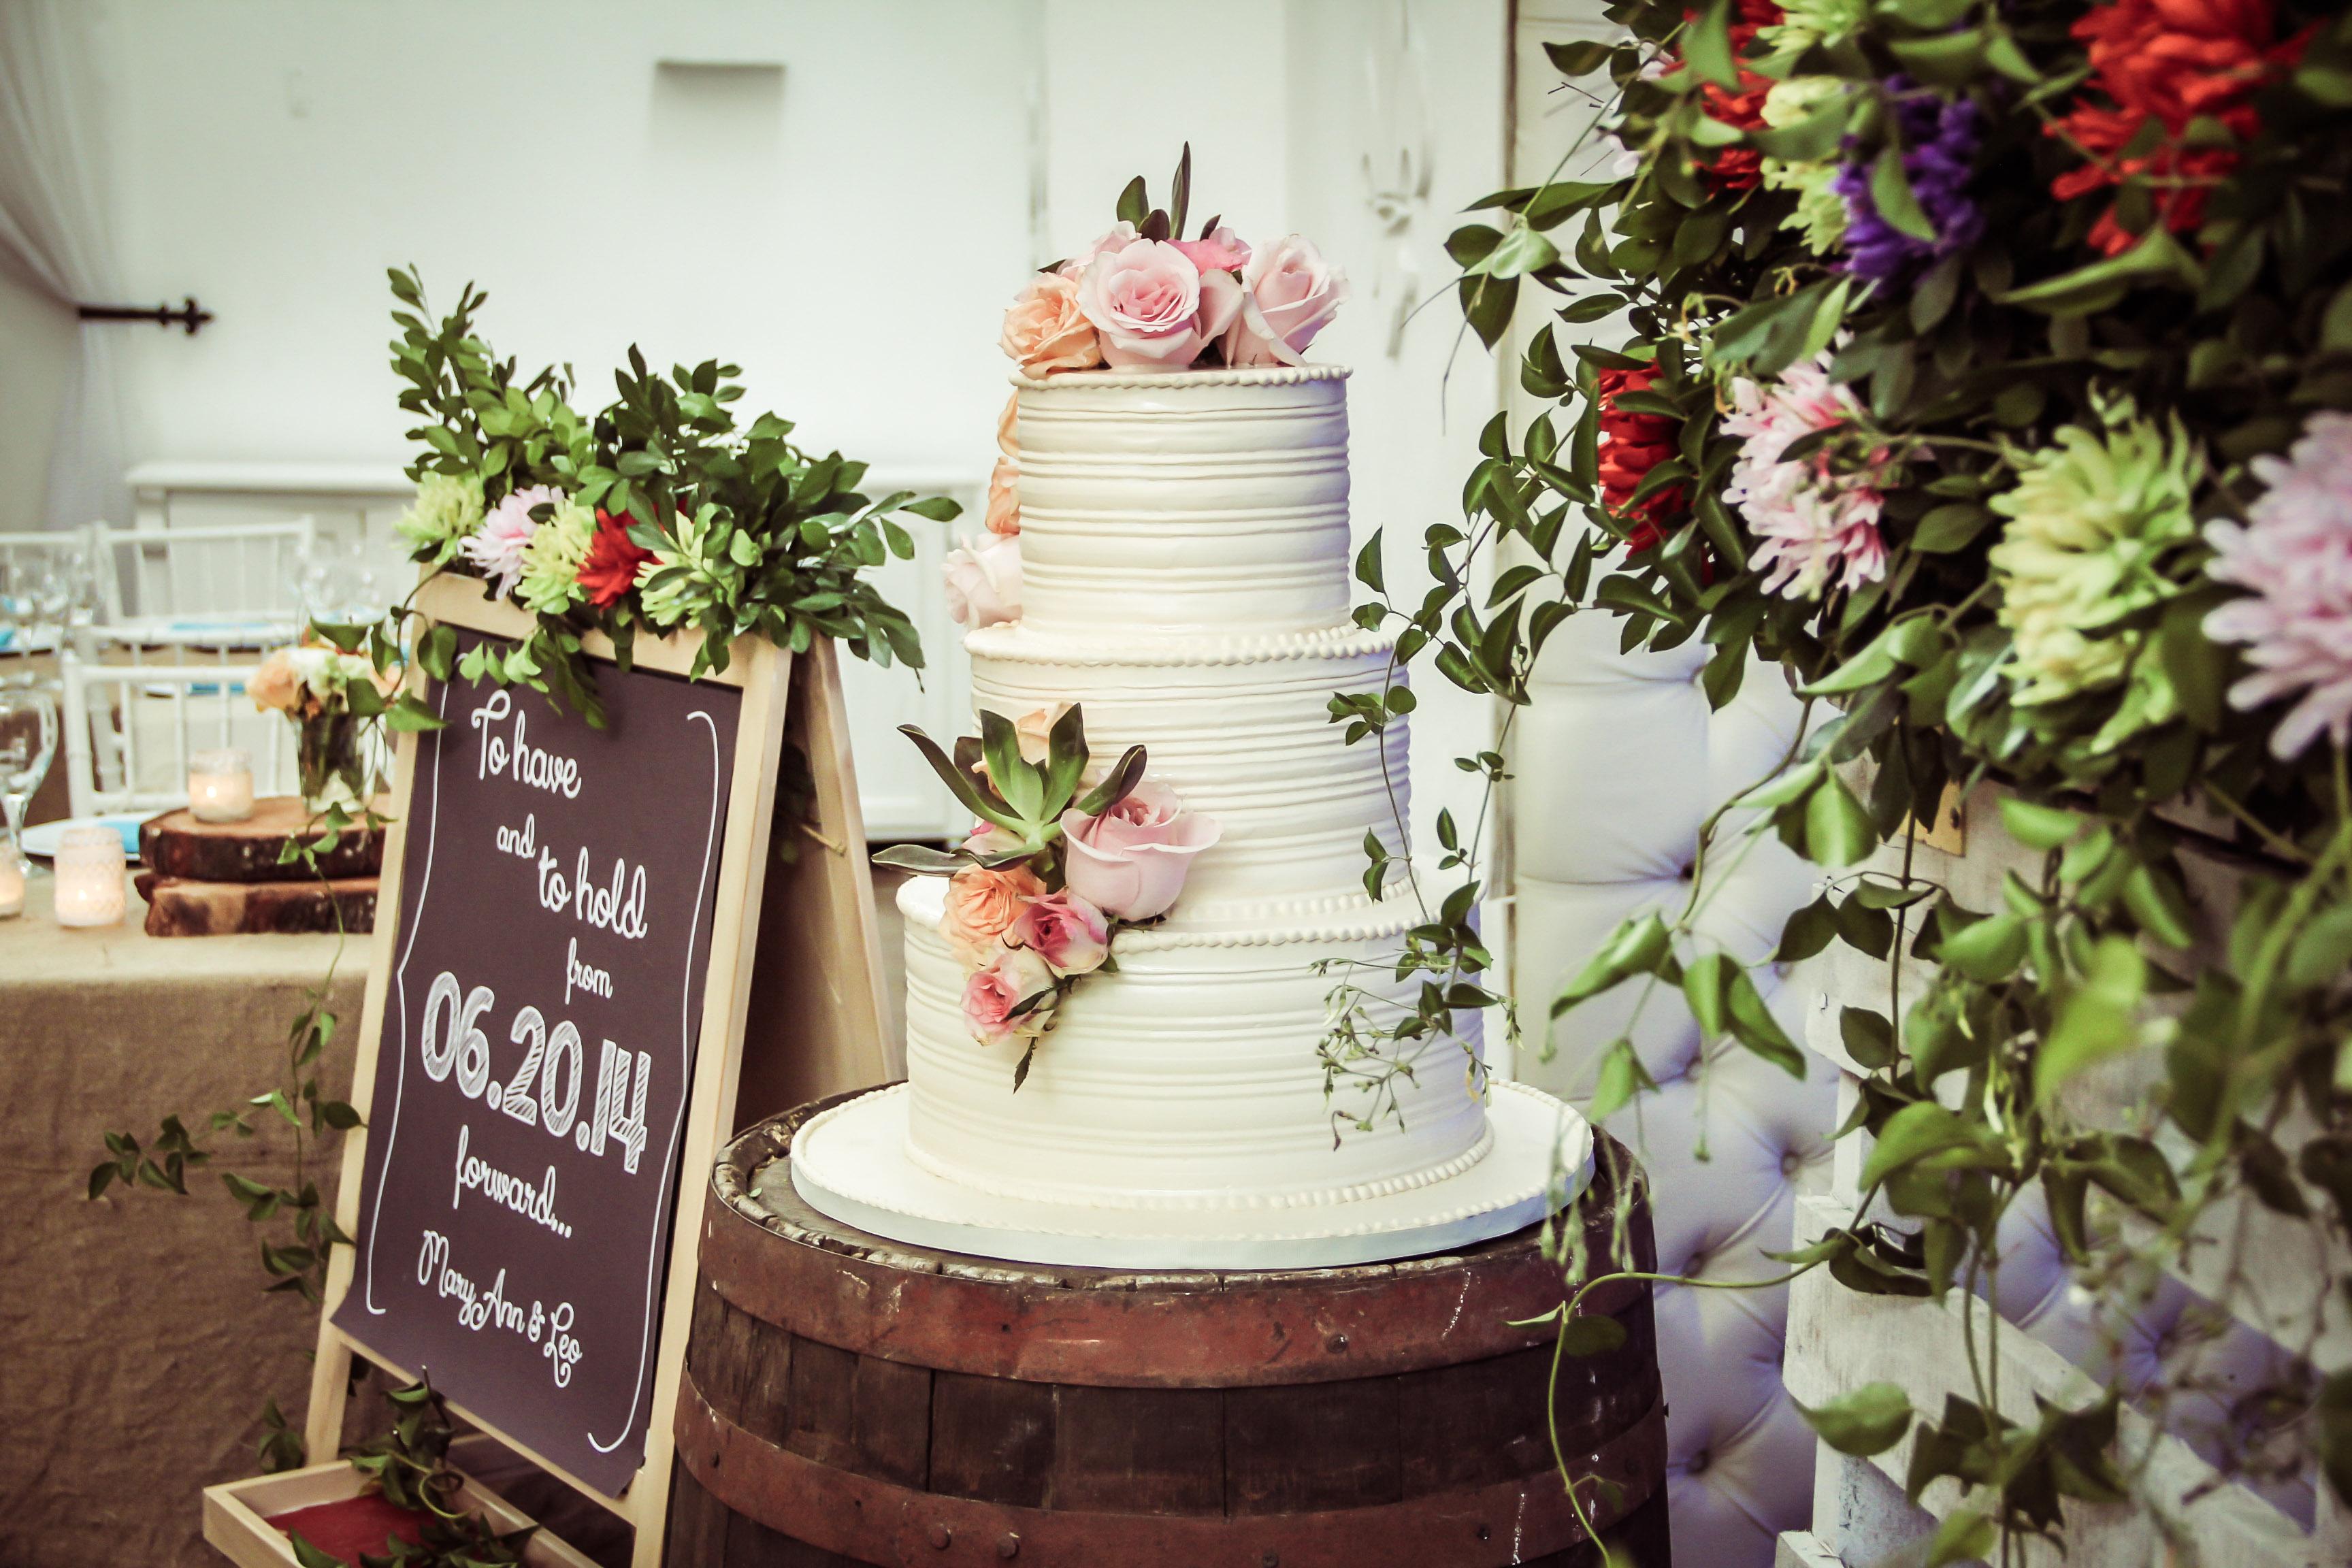 Diana cardona wedding